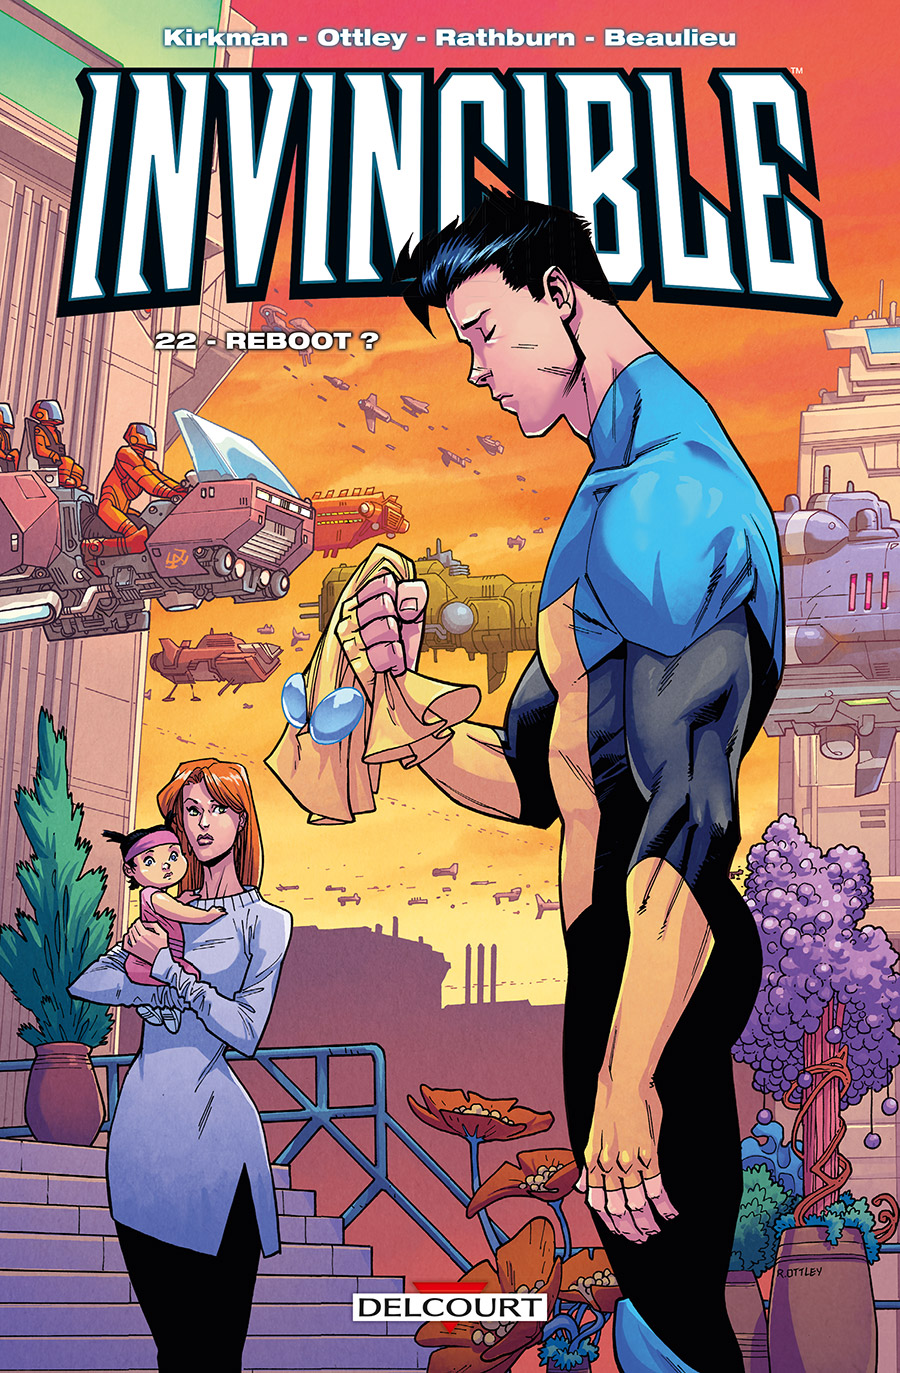 Invincible 22 - Reboot ?